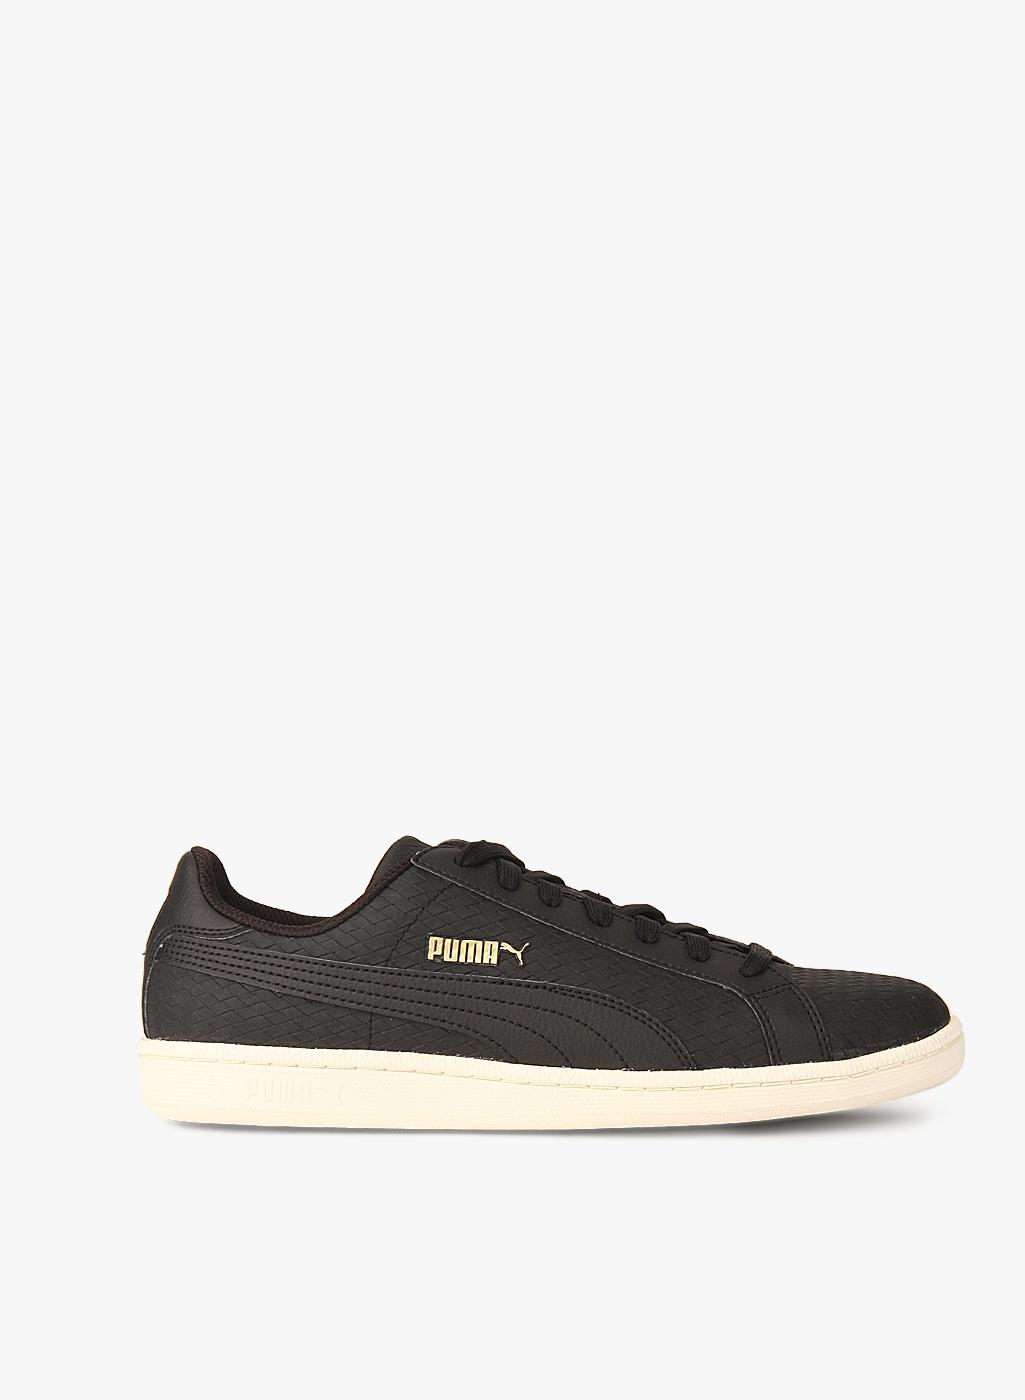 96ba438f50d3 Puma Smash Sd Black Sneakers 5132732.htm Men Footwear - Buy Puma Smash Sd  Black Sneakers 5132732.htm Men Footwear online in India - Jabong